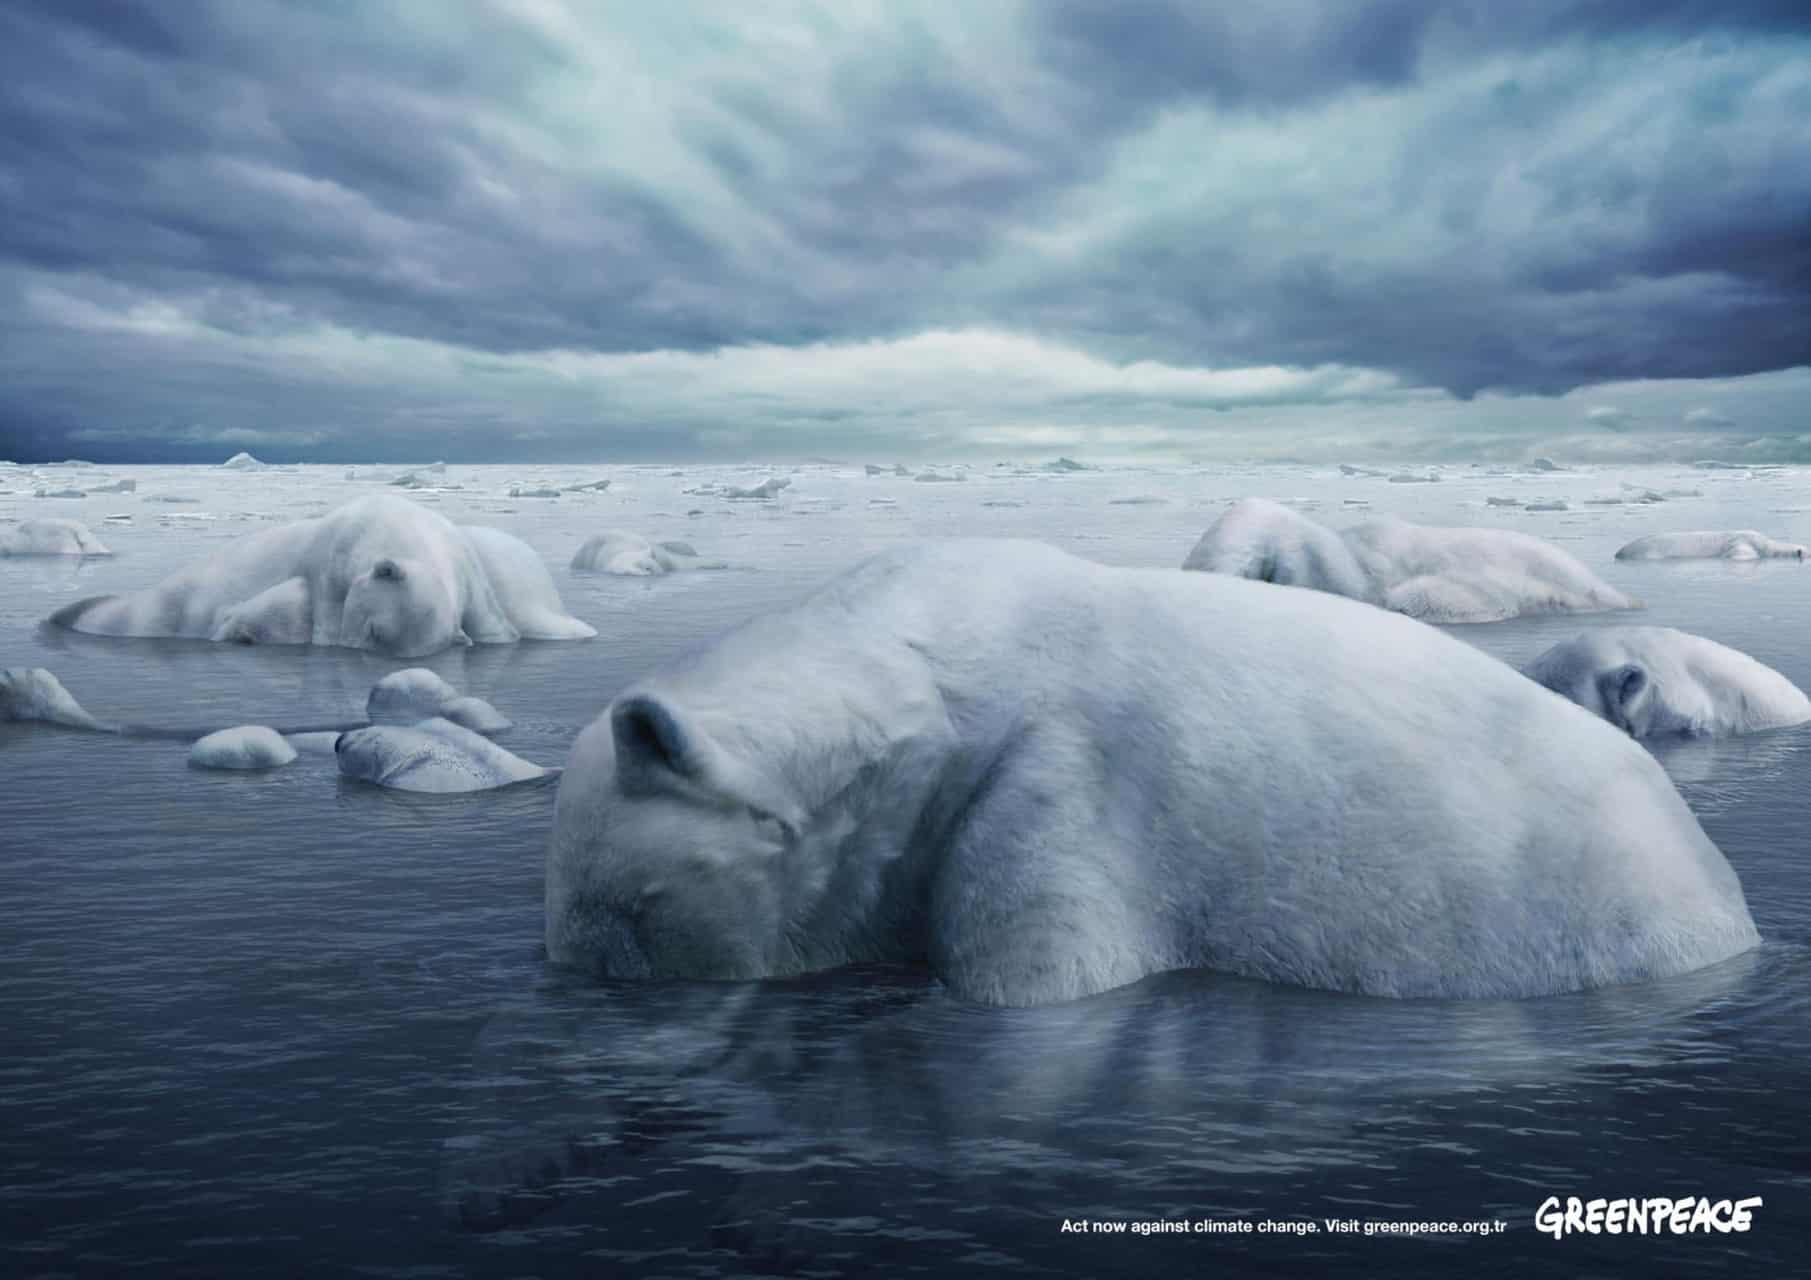 Pub Greenpeace